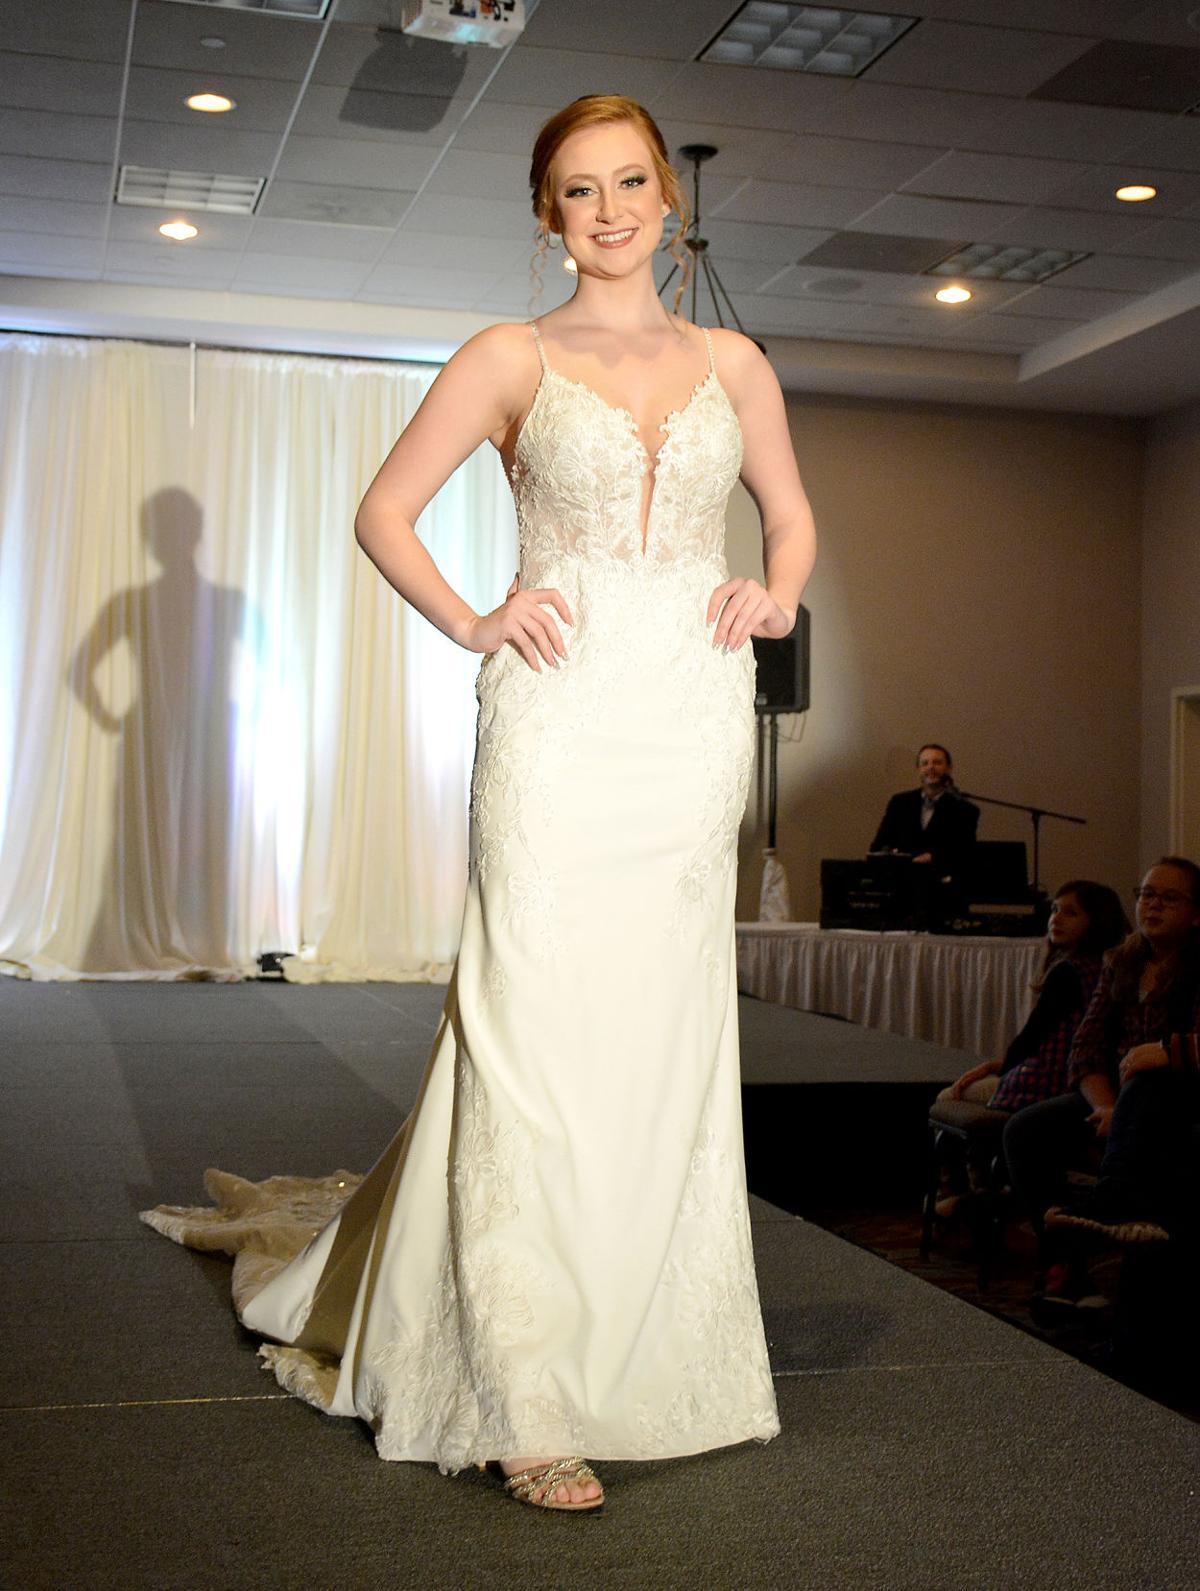 Bridal Expo draws large crowd